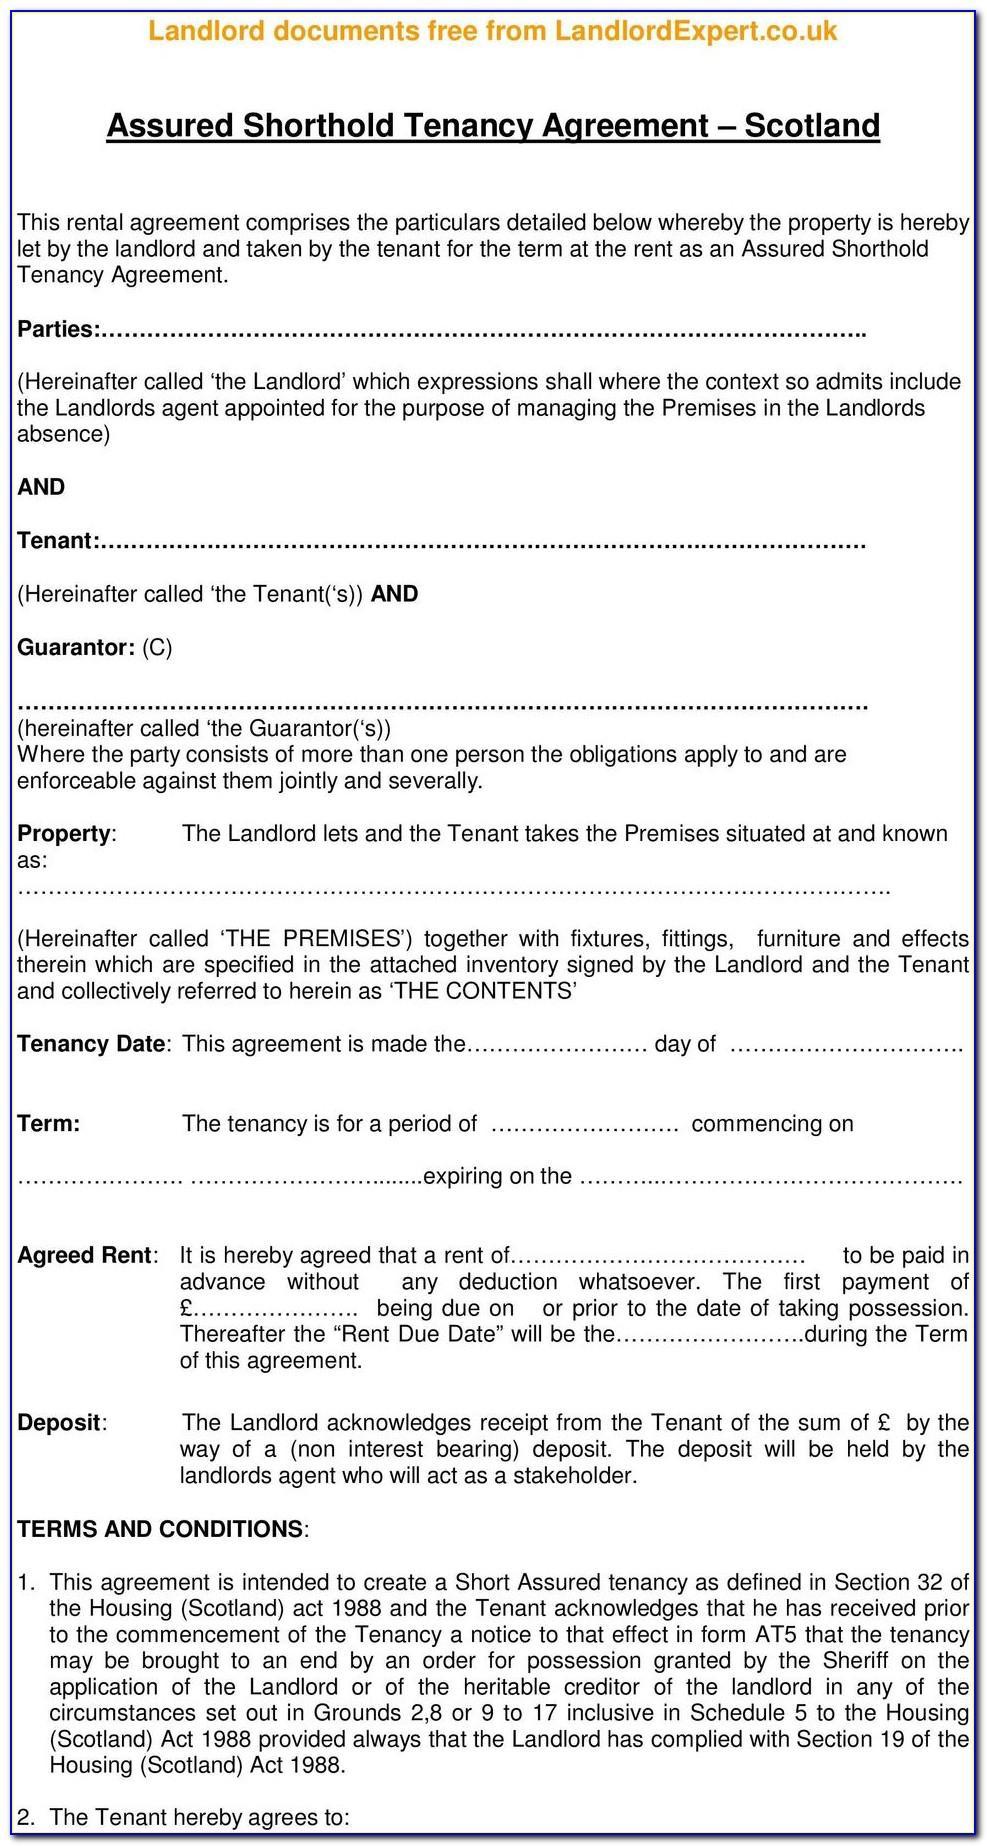 Free Assured Short Term Tenancy Agreement Template Scotland